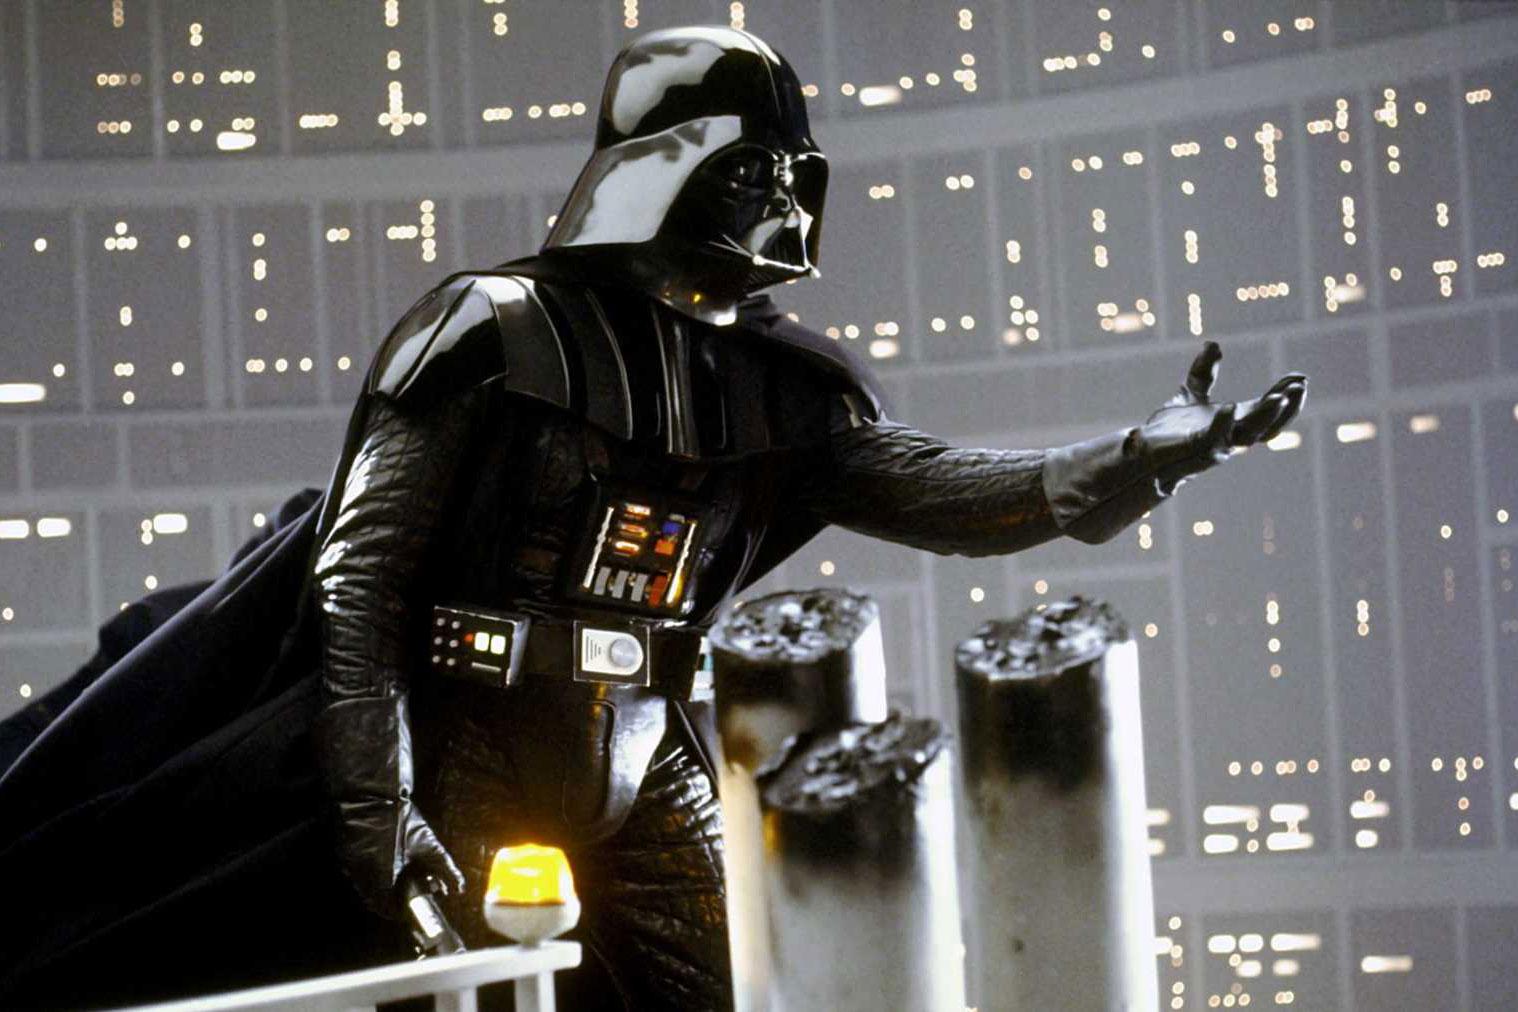 Star Wars V: The Empire Strikes Back